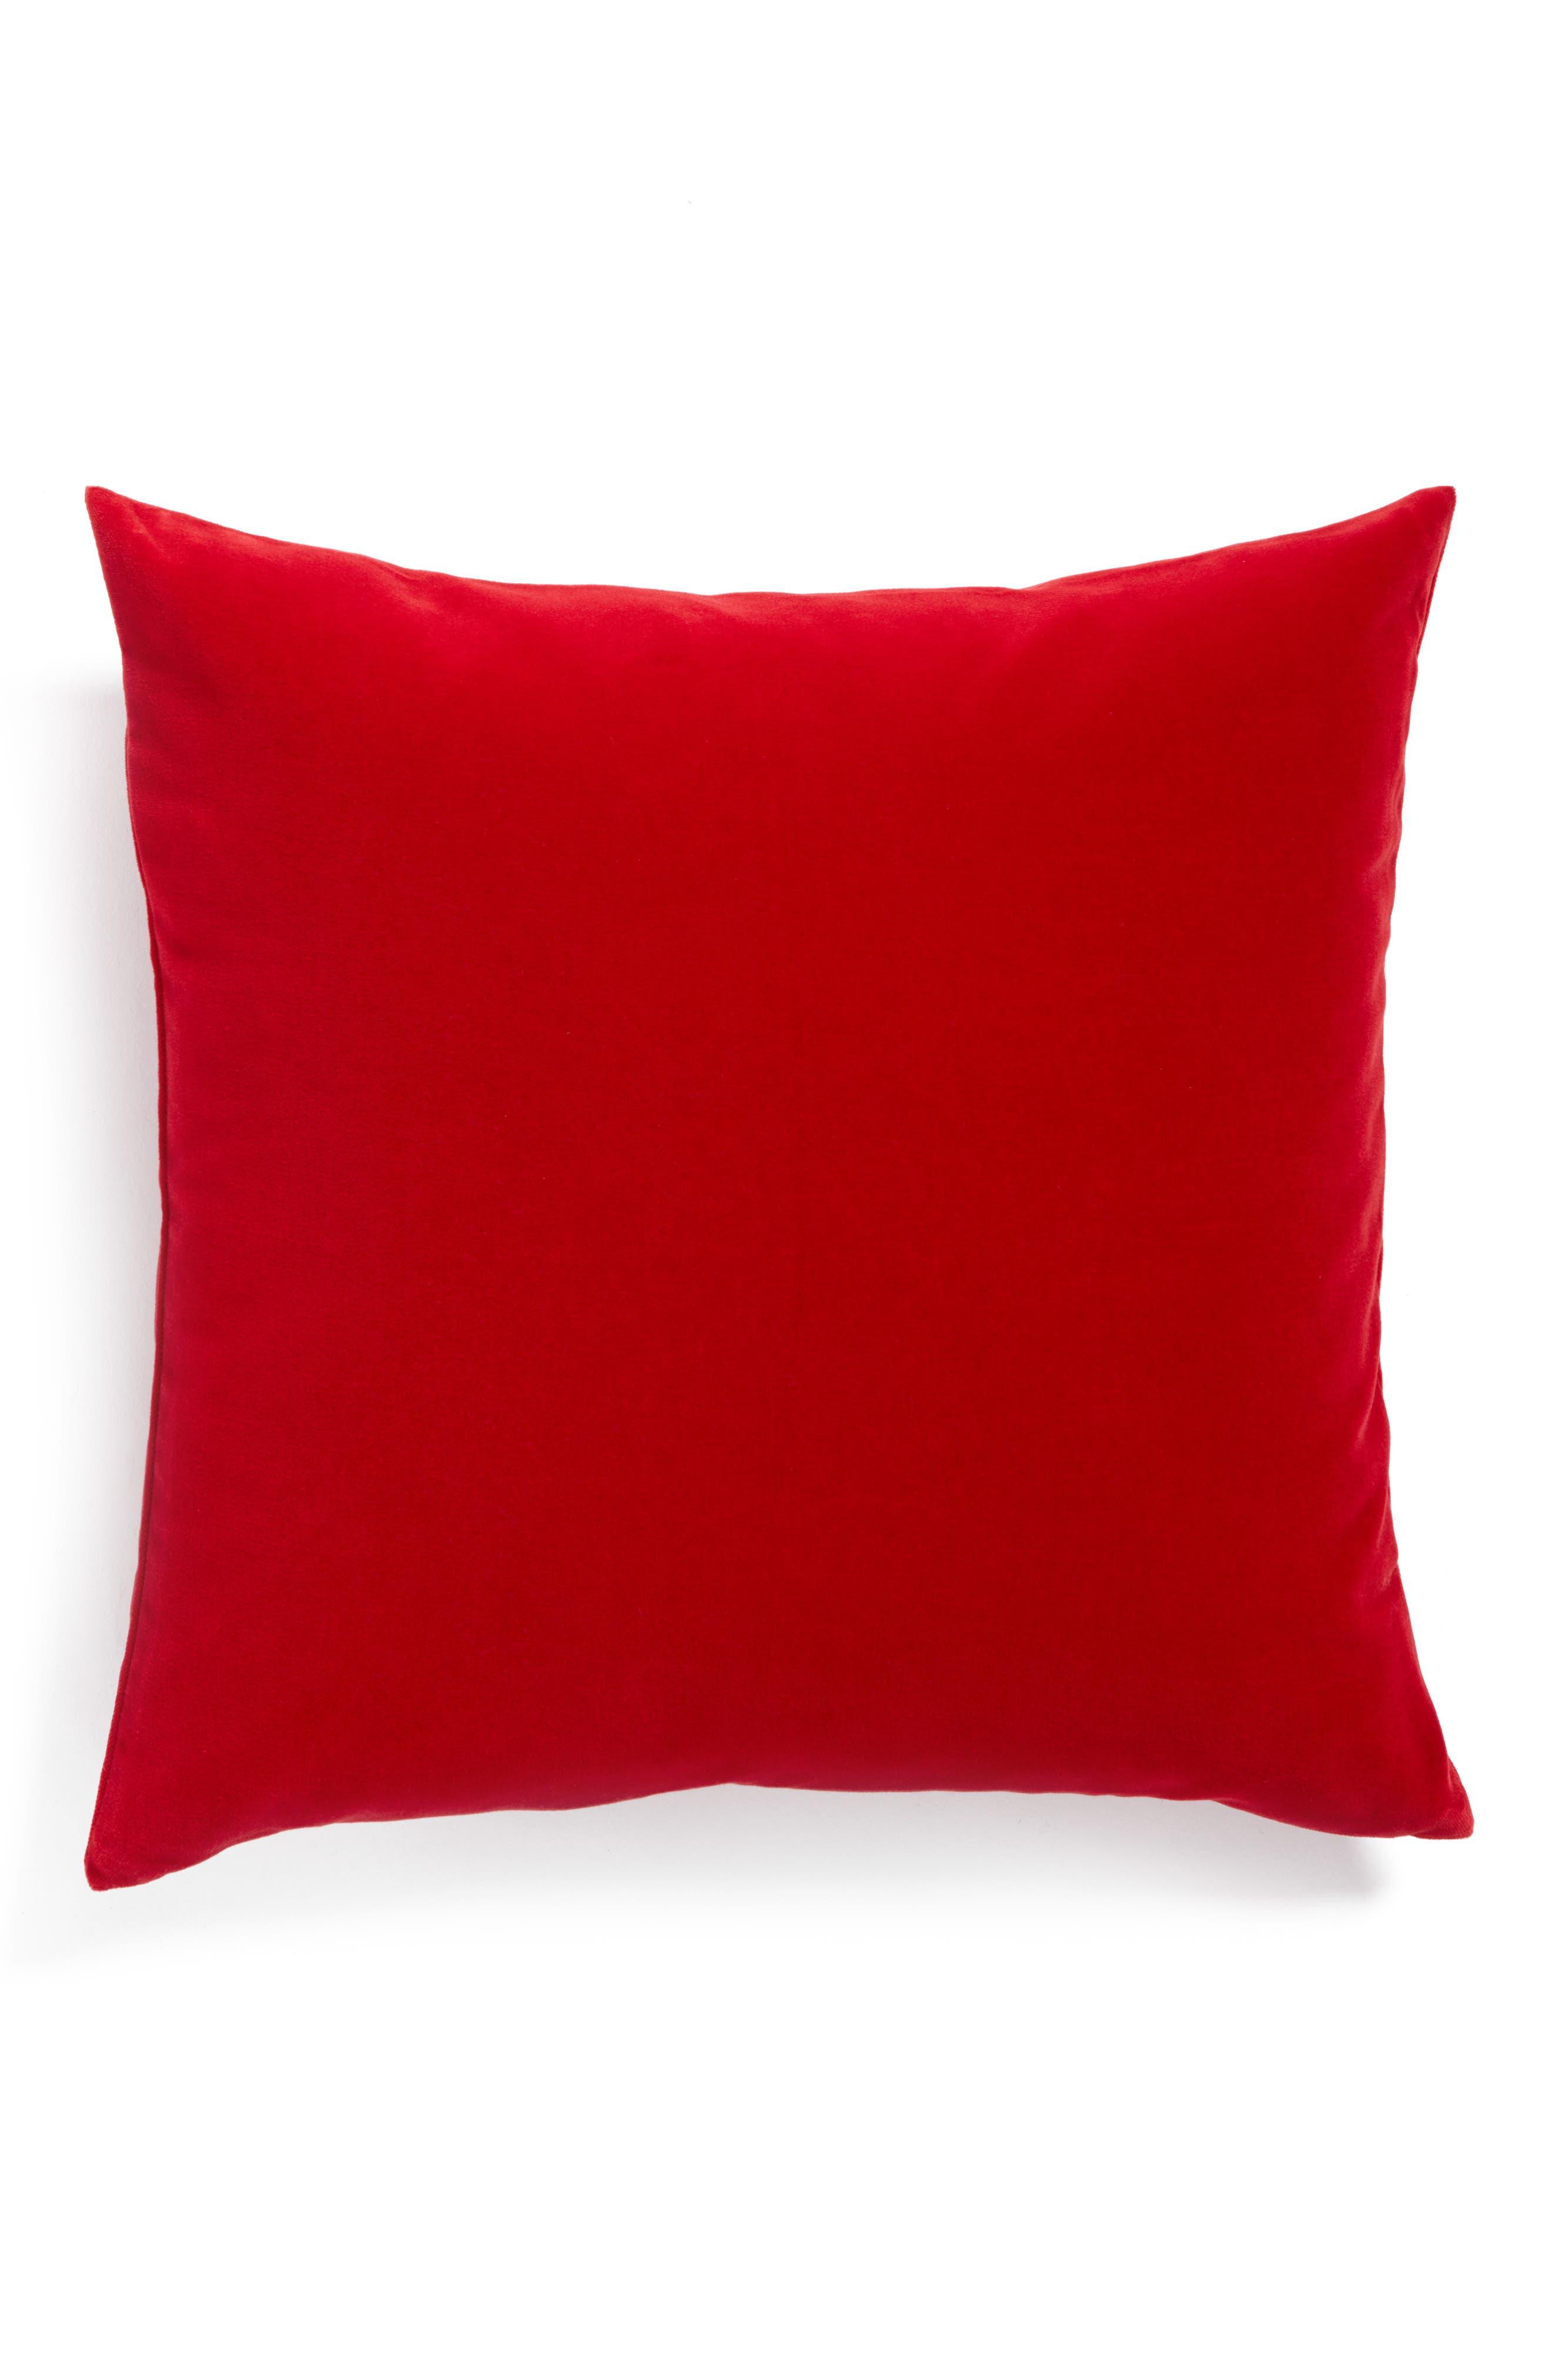 Lucerne Velvet Pillow,                         Main,                         color, Oxblood